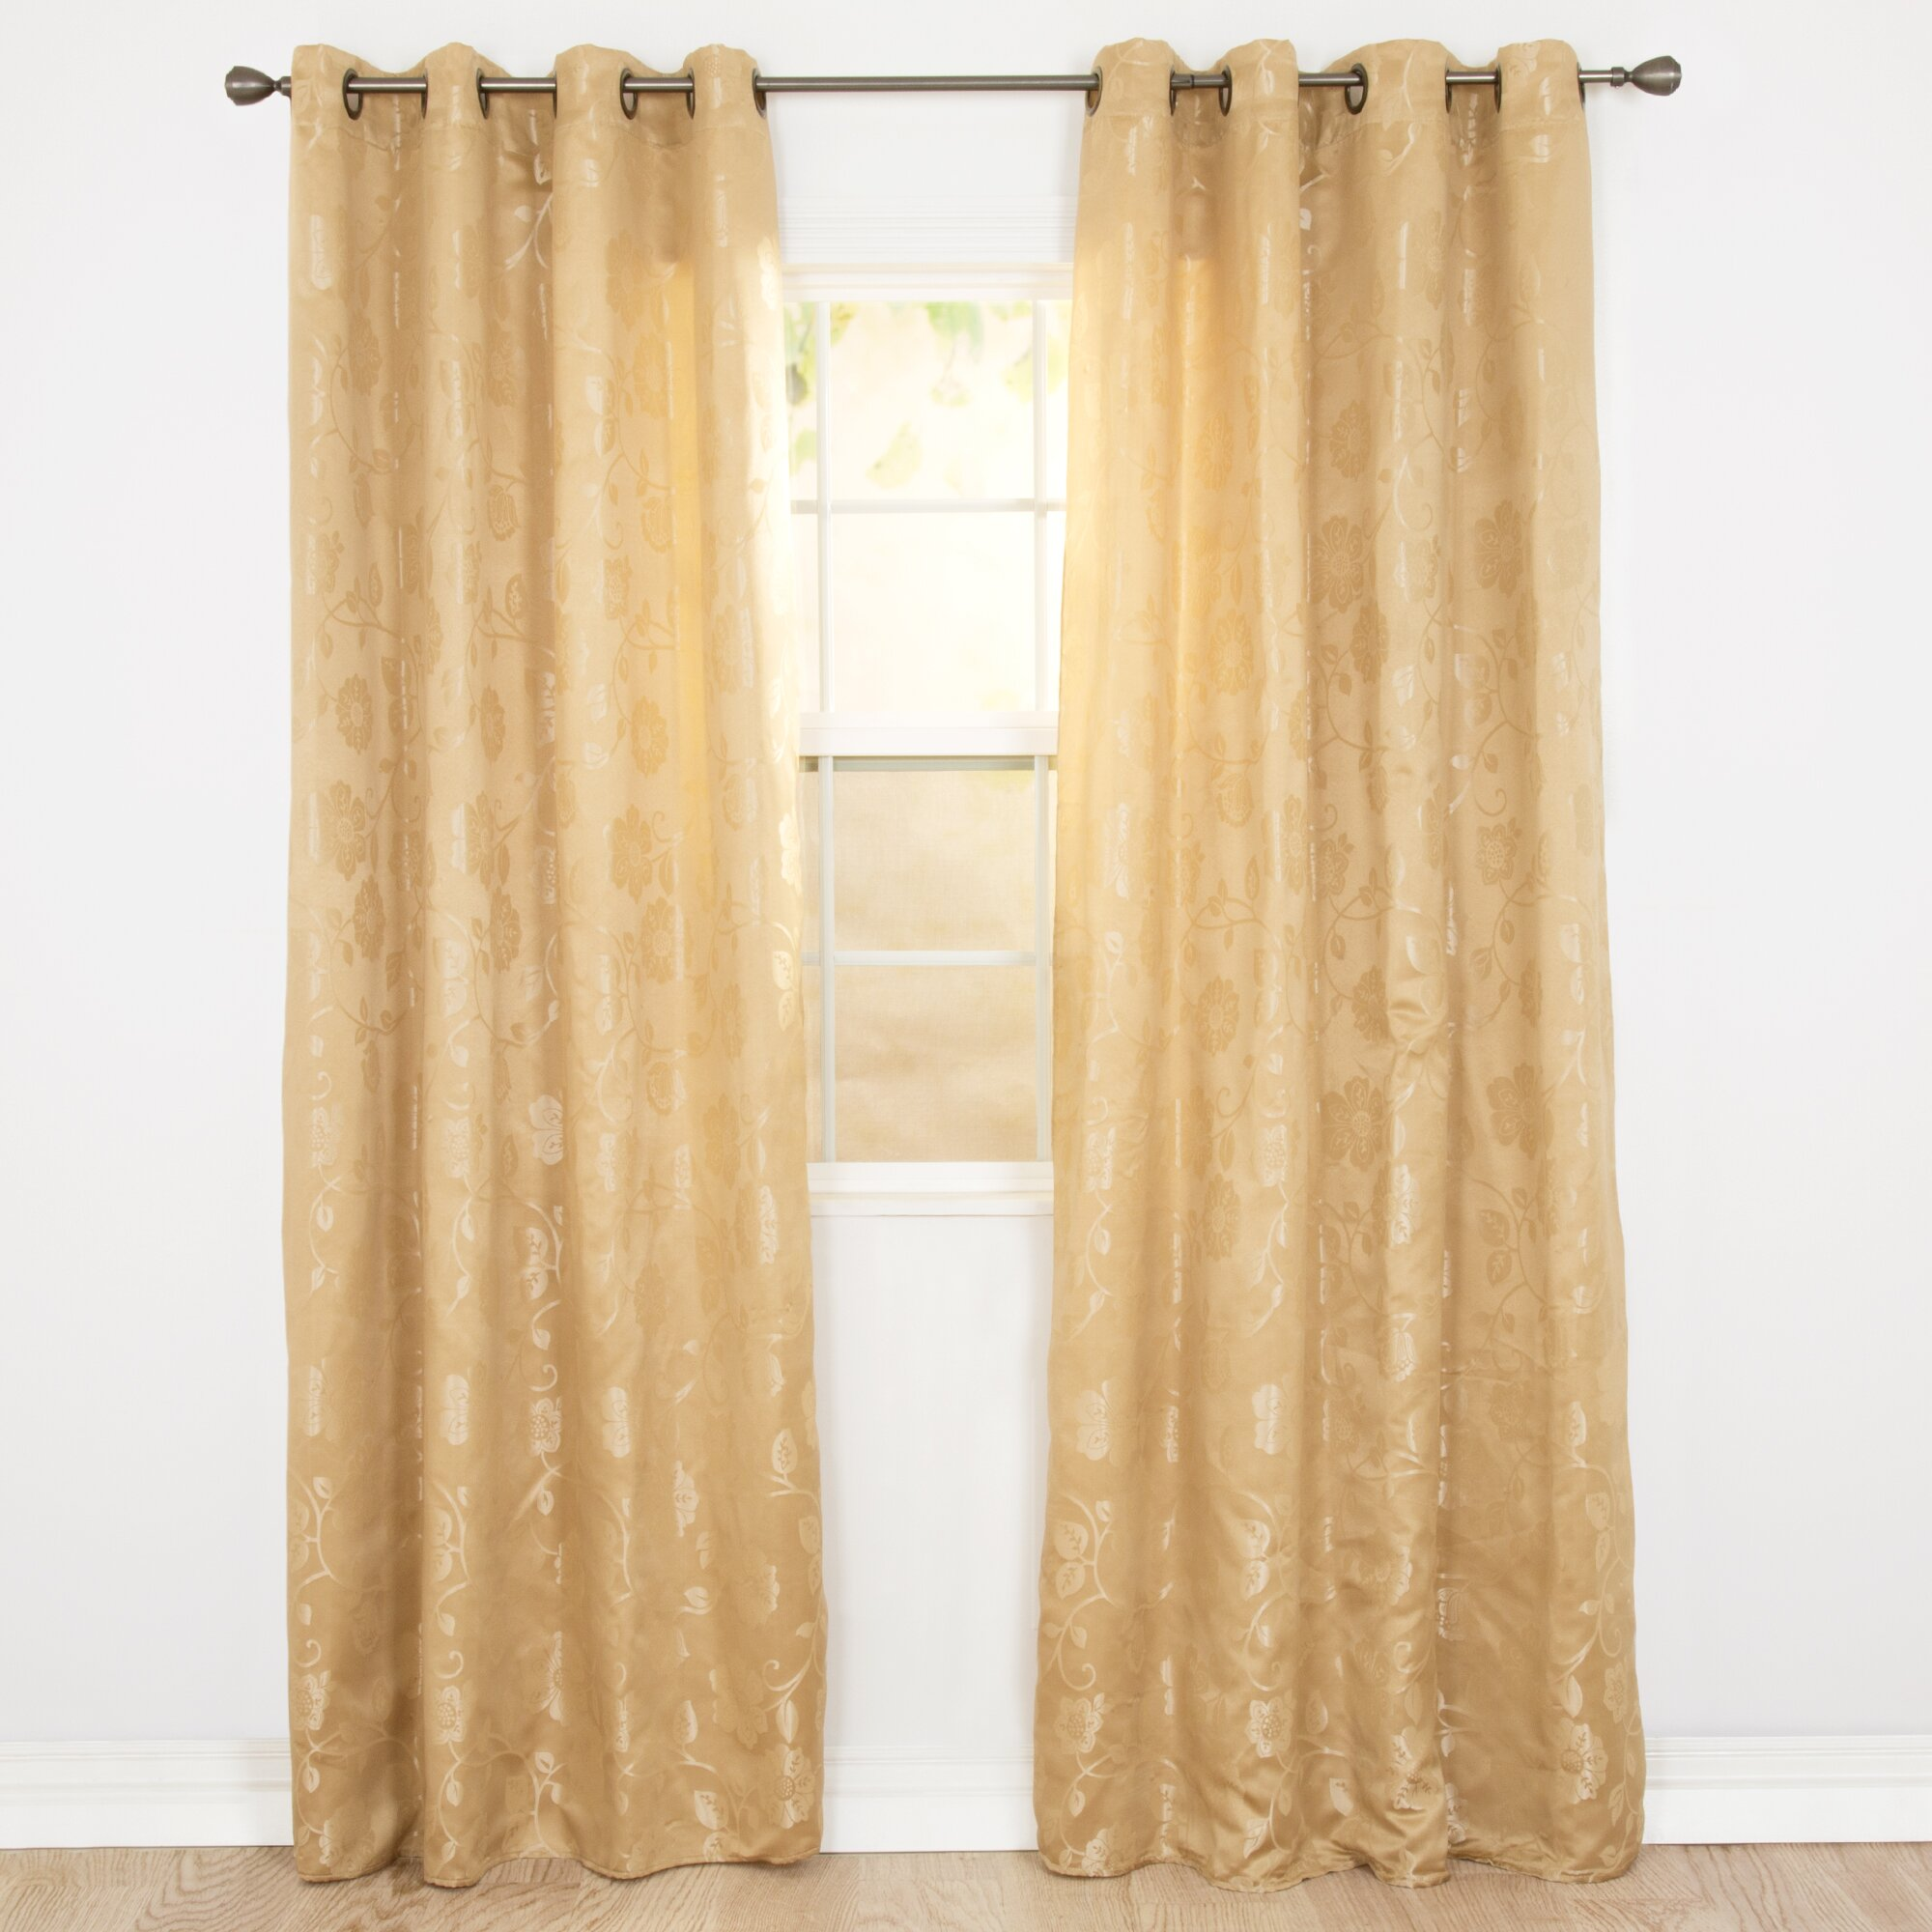 window treatments curtains drapes 84 94 length curtains